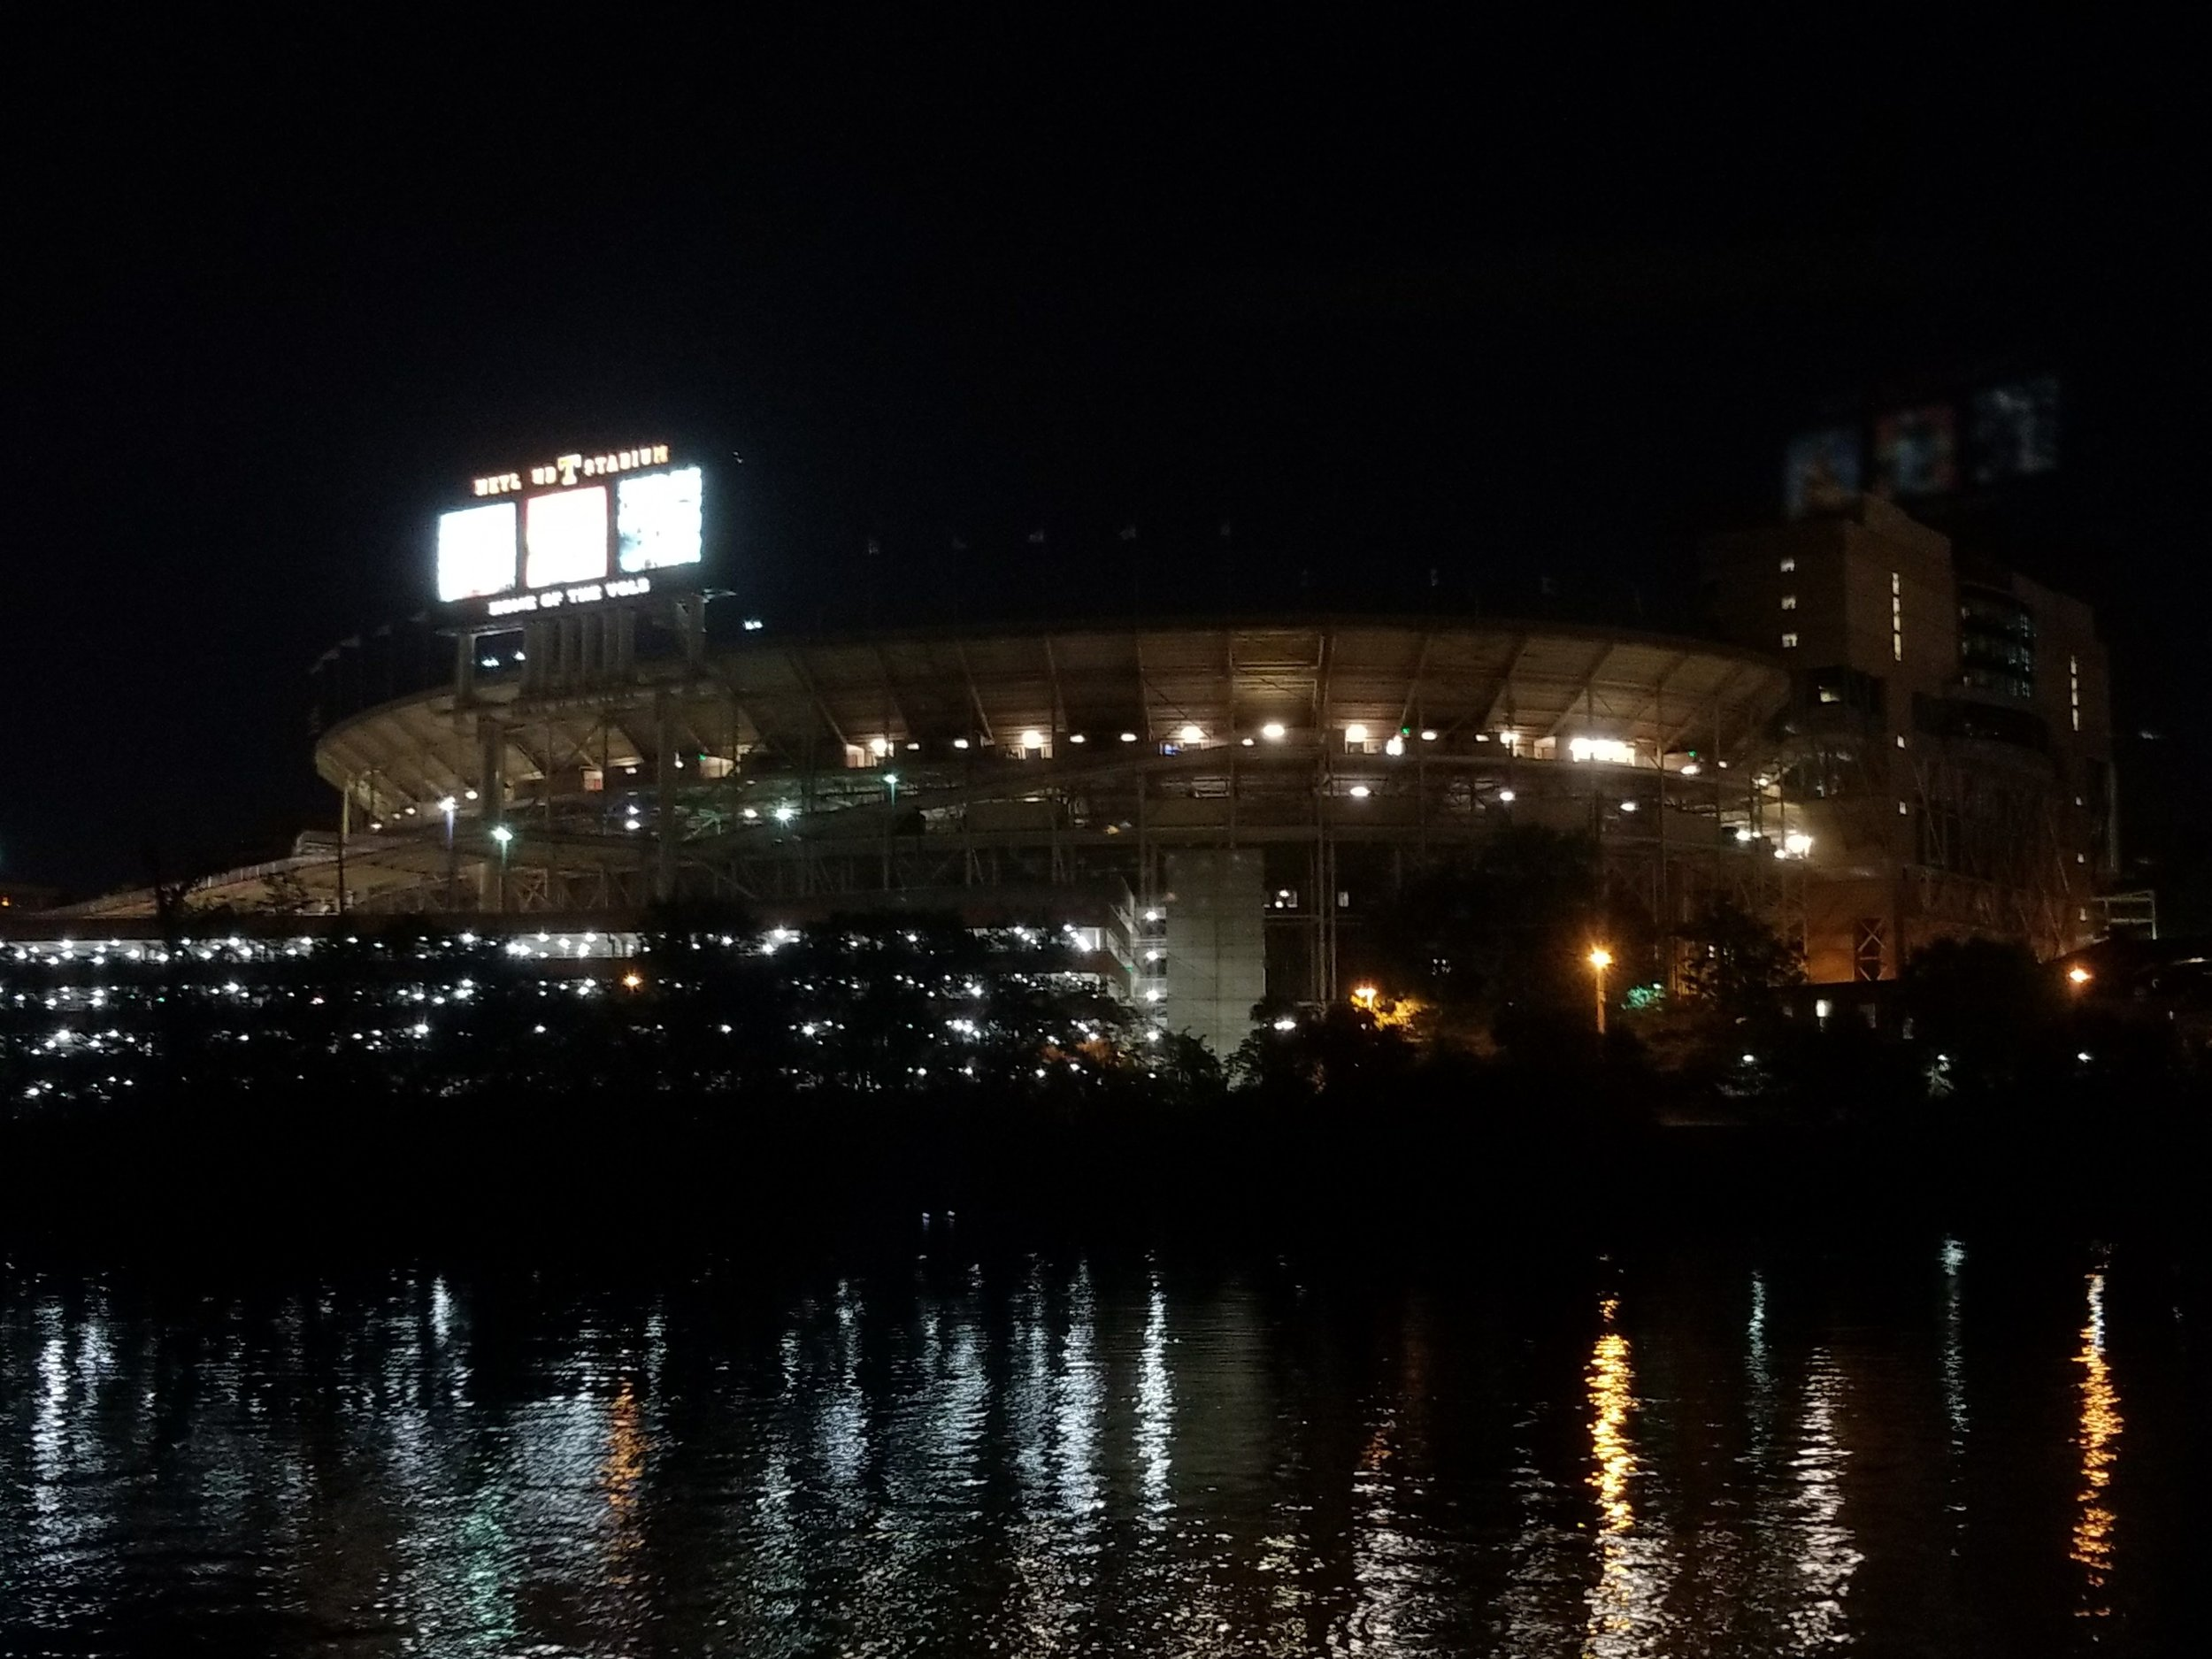 paddling past Neyland Stadium